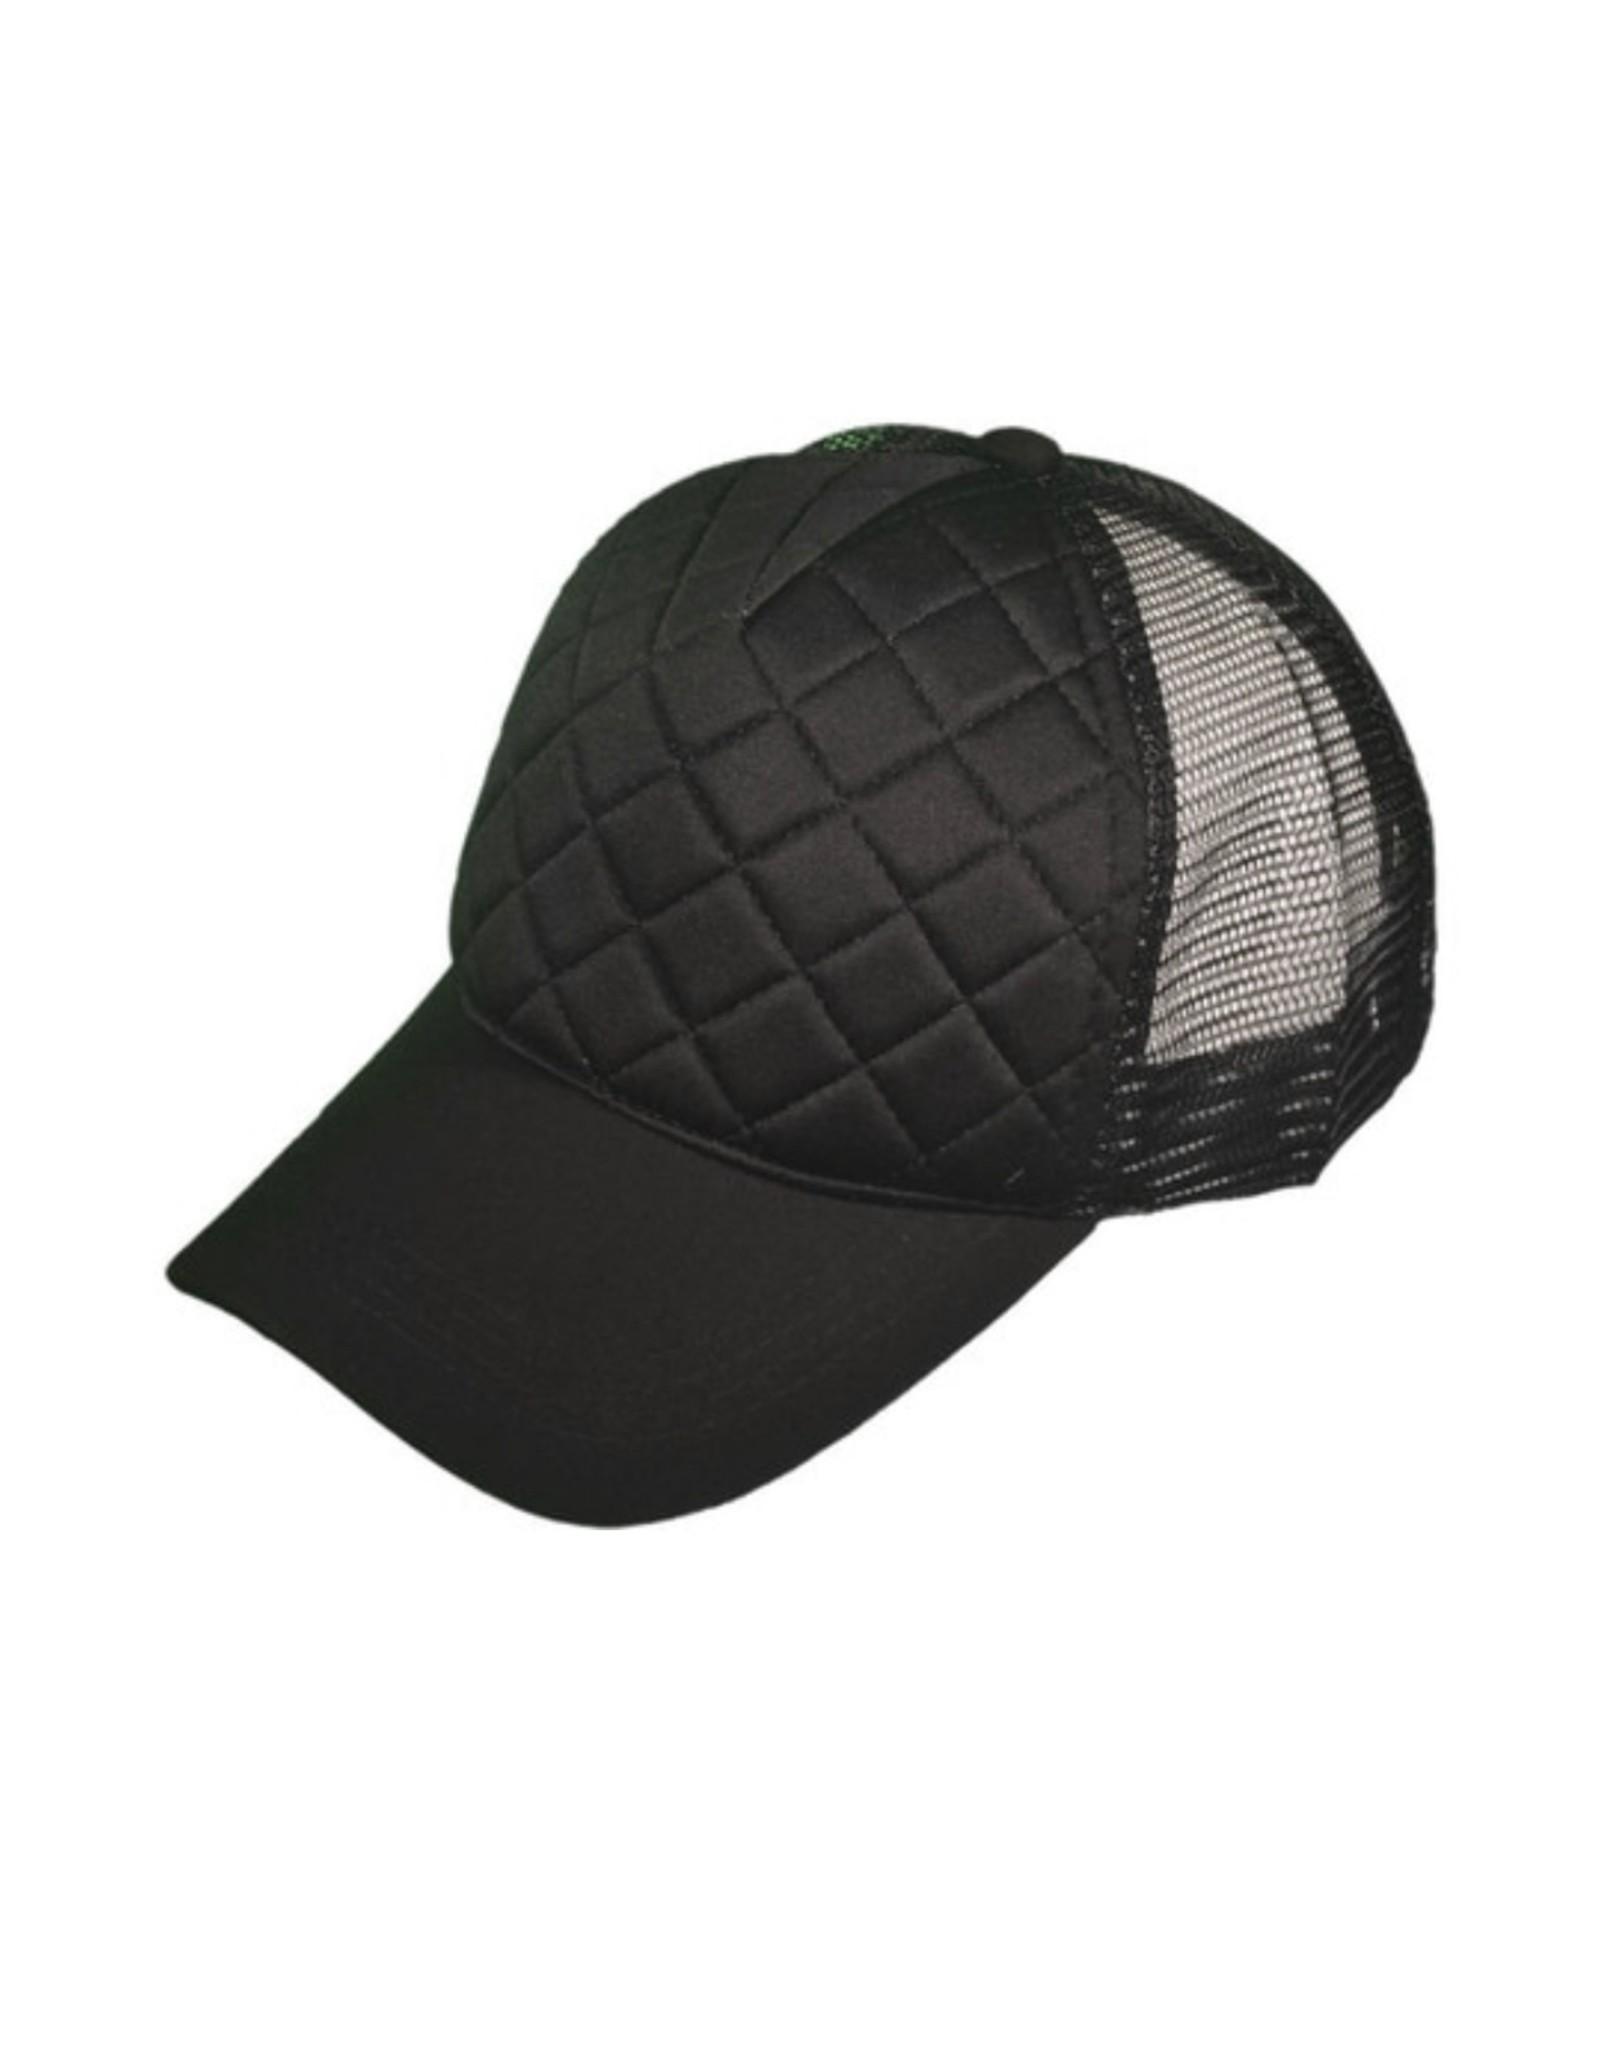 Buck Wholesale QUILTED Foam Trucker Hats